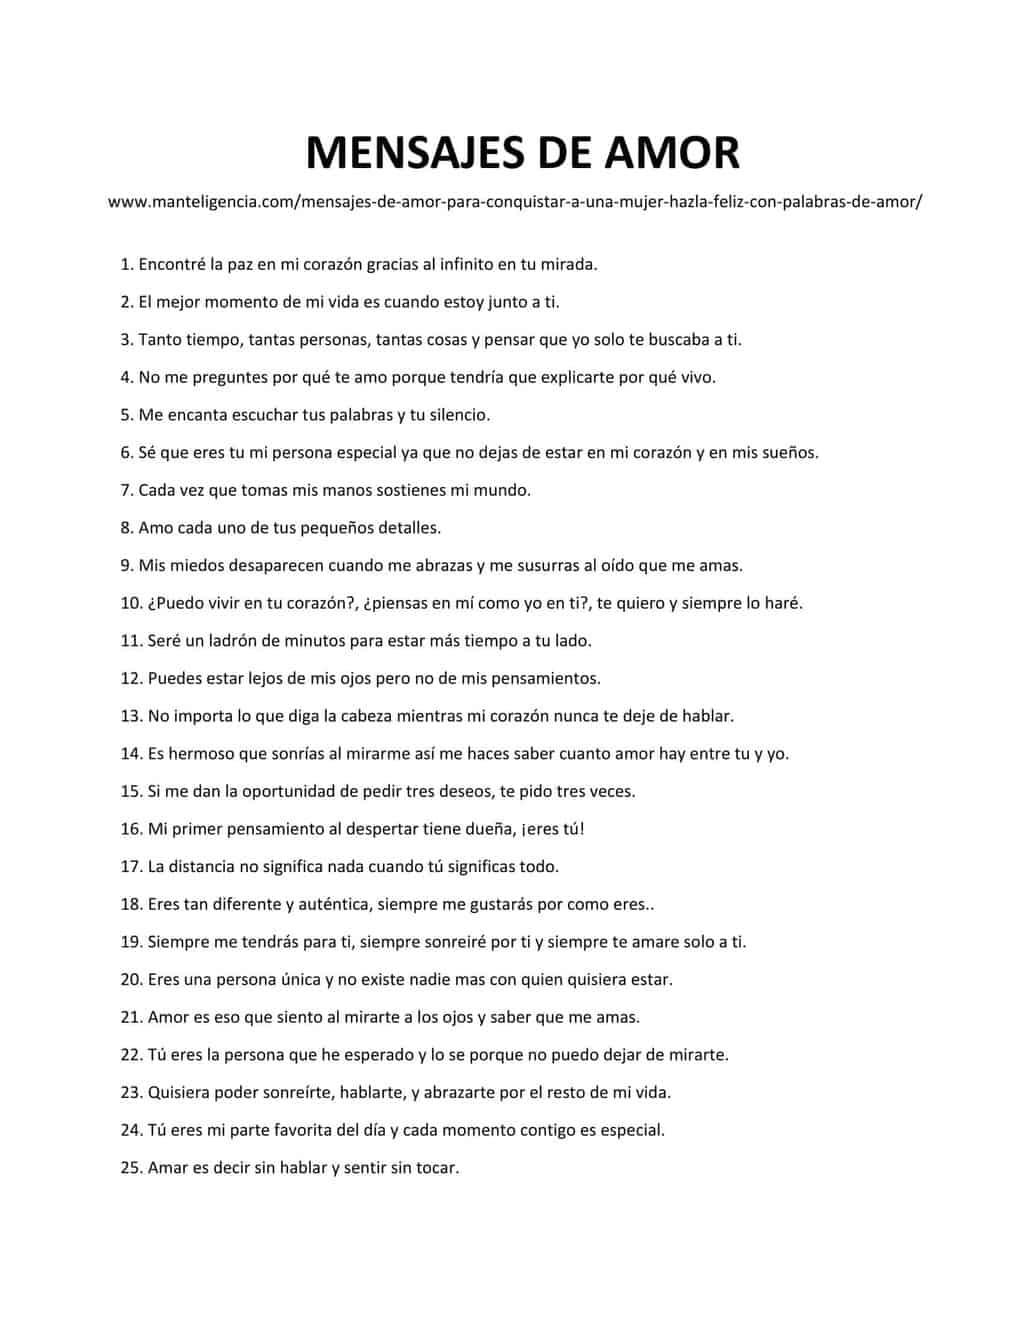 list of MENSAJES DE AMOR-1